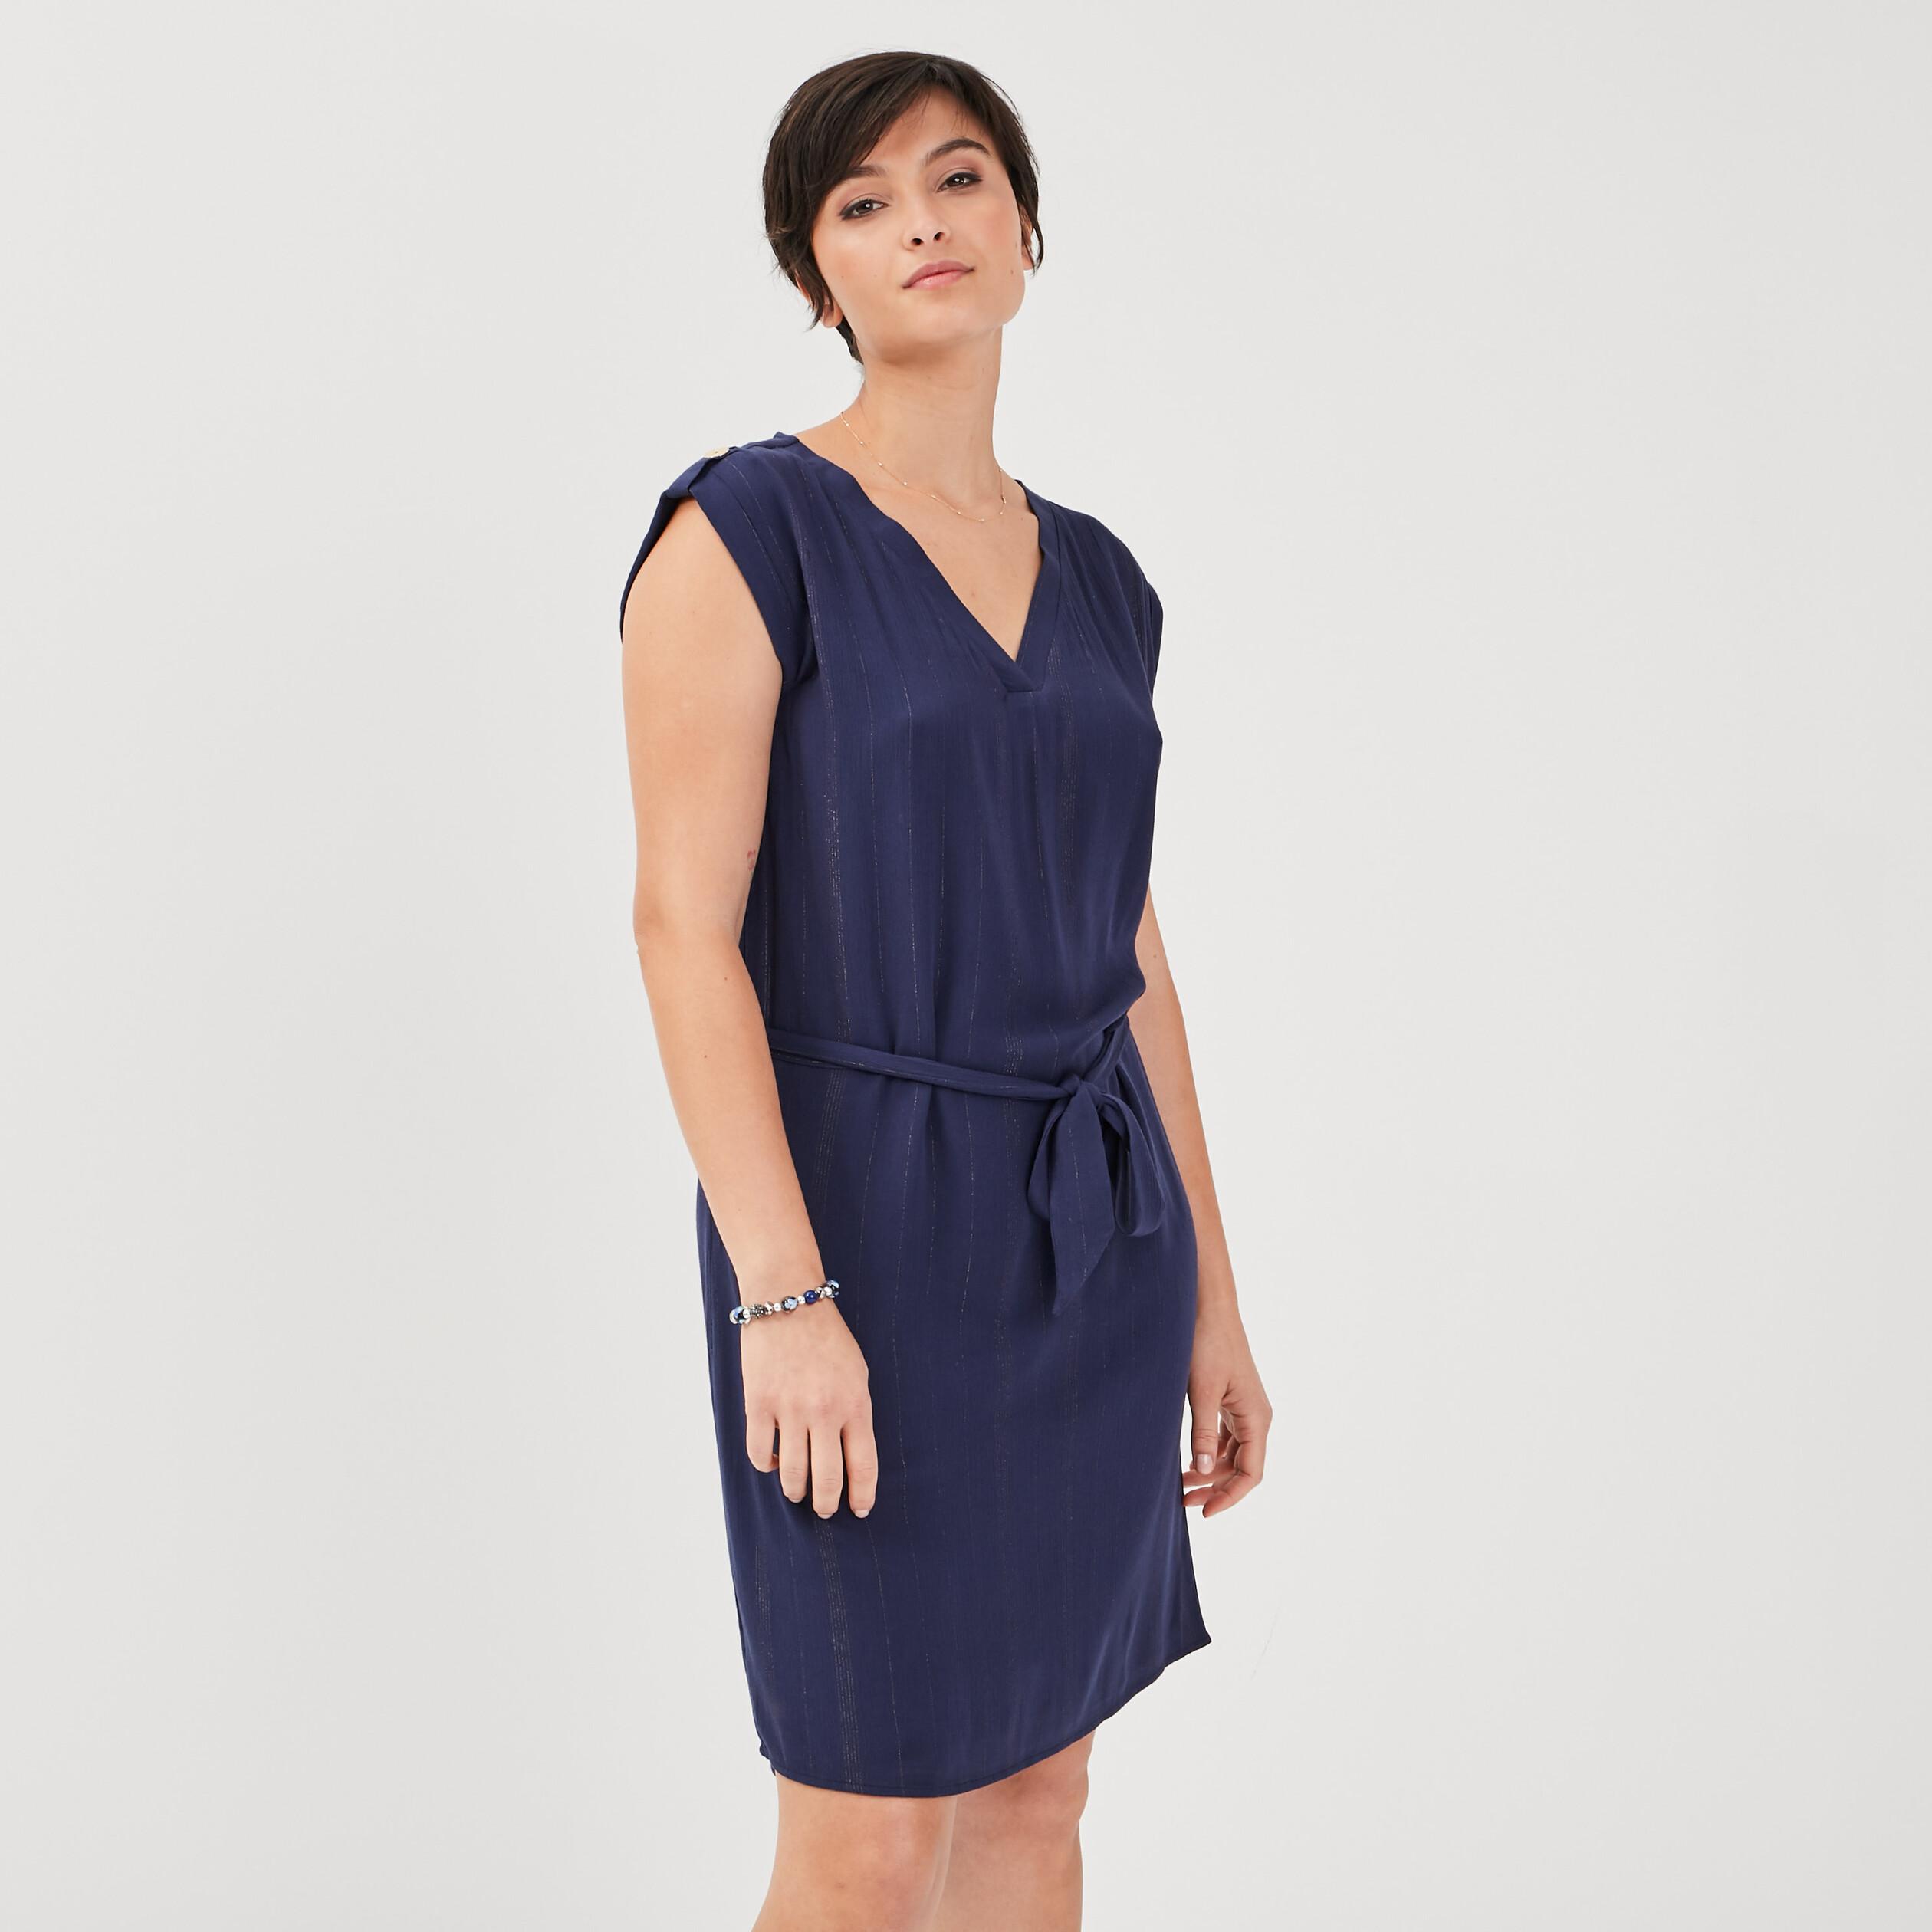 Robe droite ceinturée bleu marine femme |